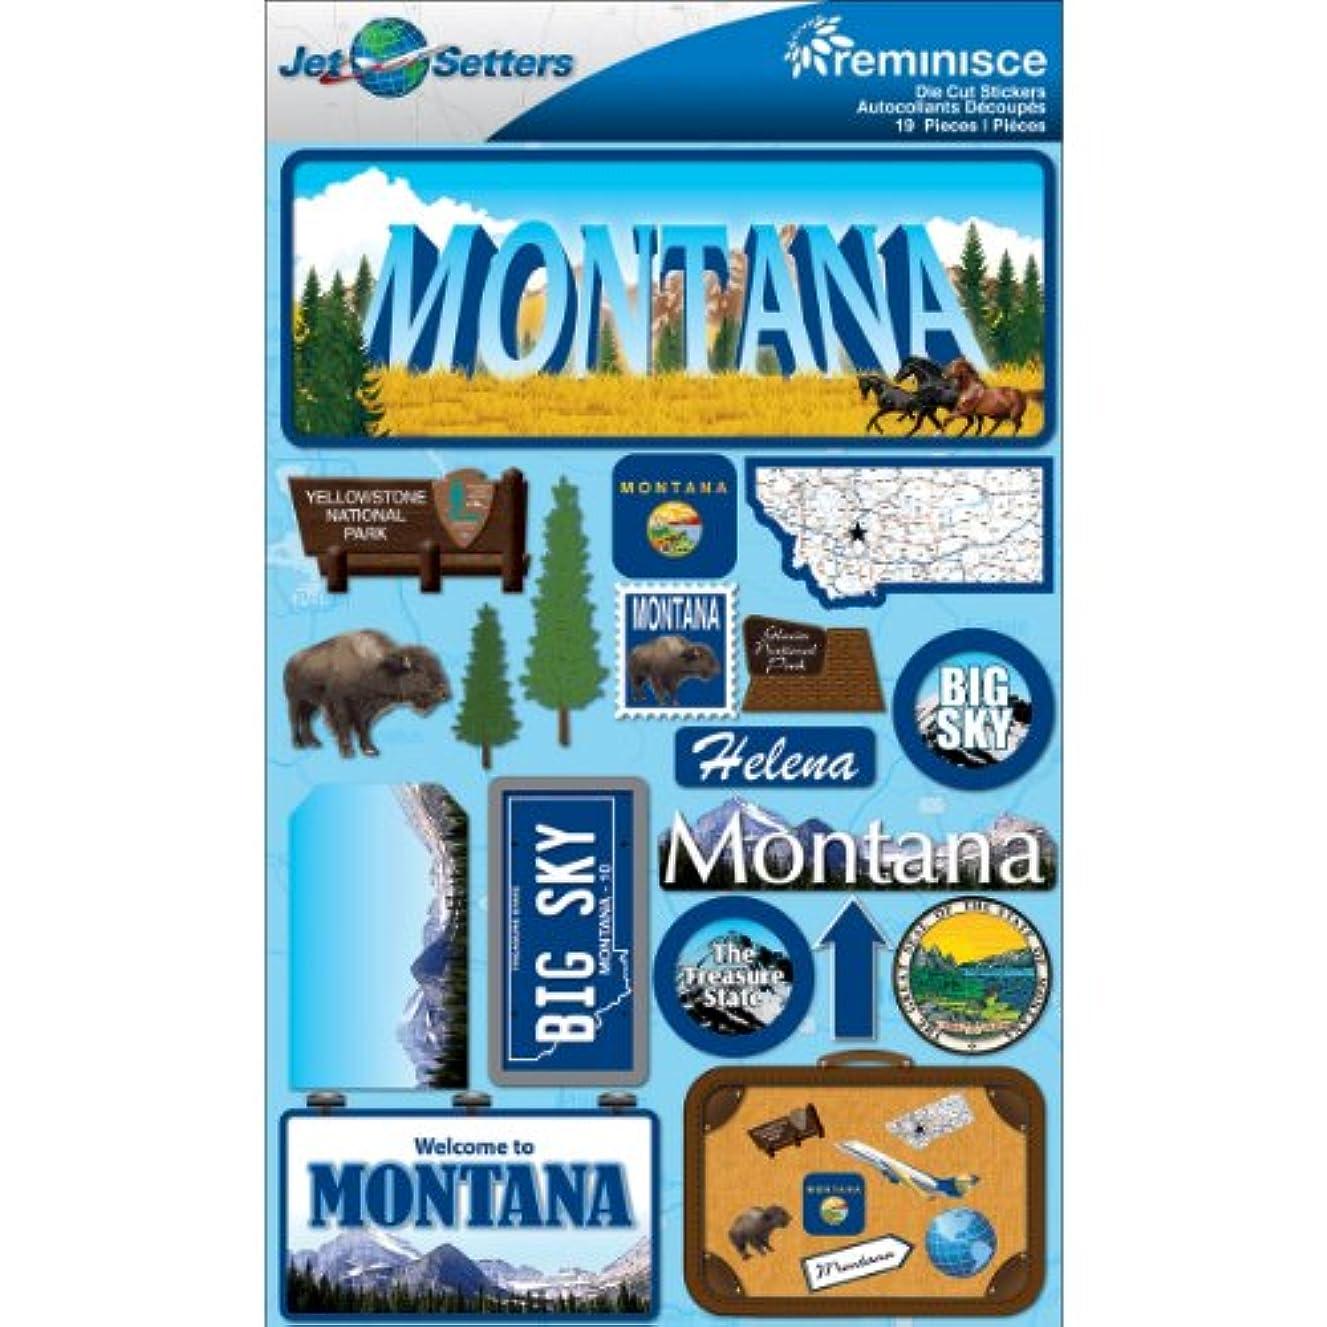 Reminisce Jet Setters 2 3-Dimensional Sticker, Montana